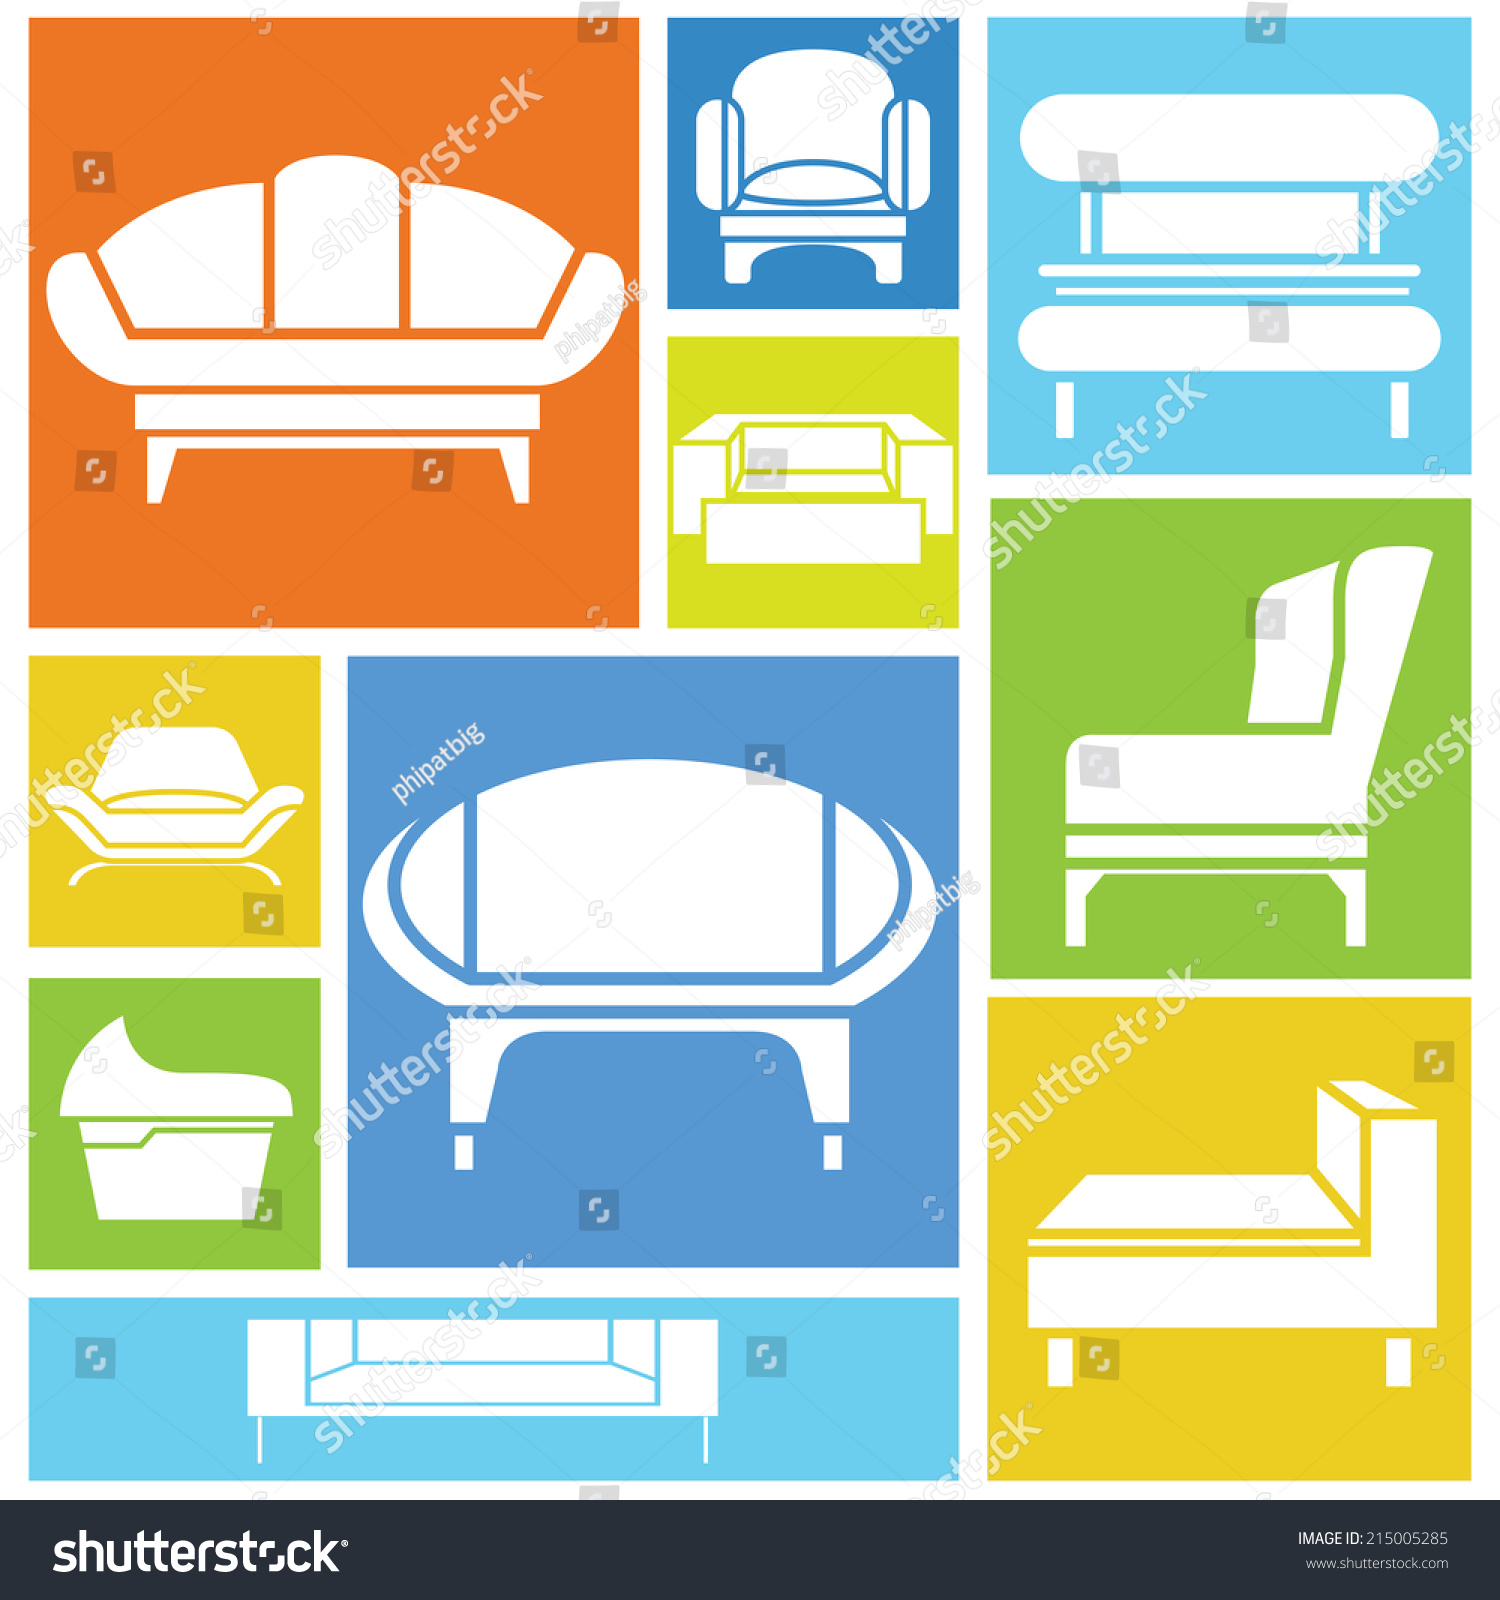 Sofa Icons Interior Design Concept Background Stock Vector Royalty Free 215005285